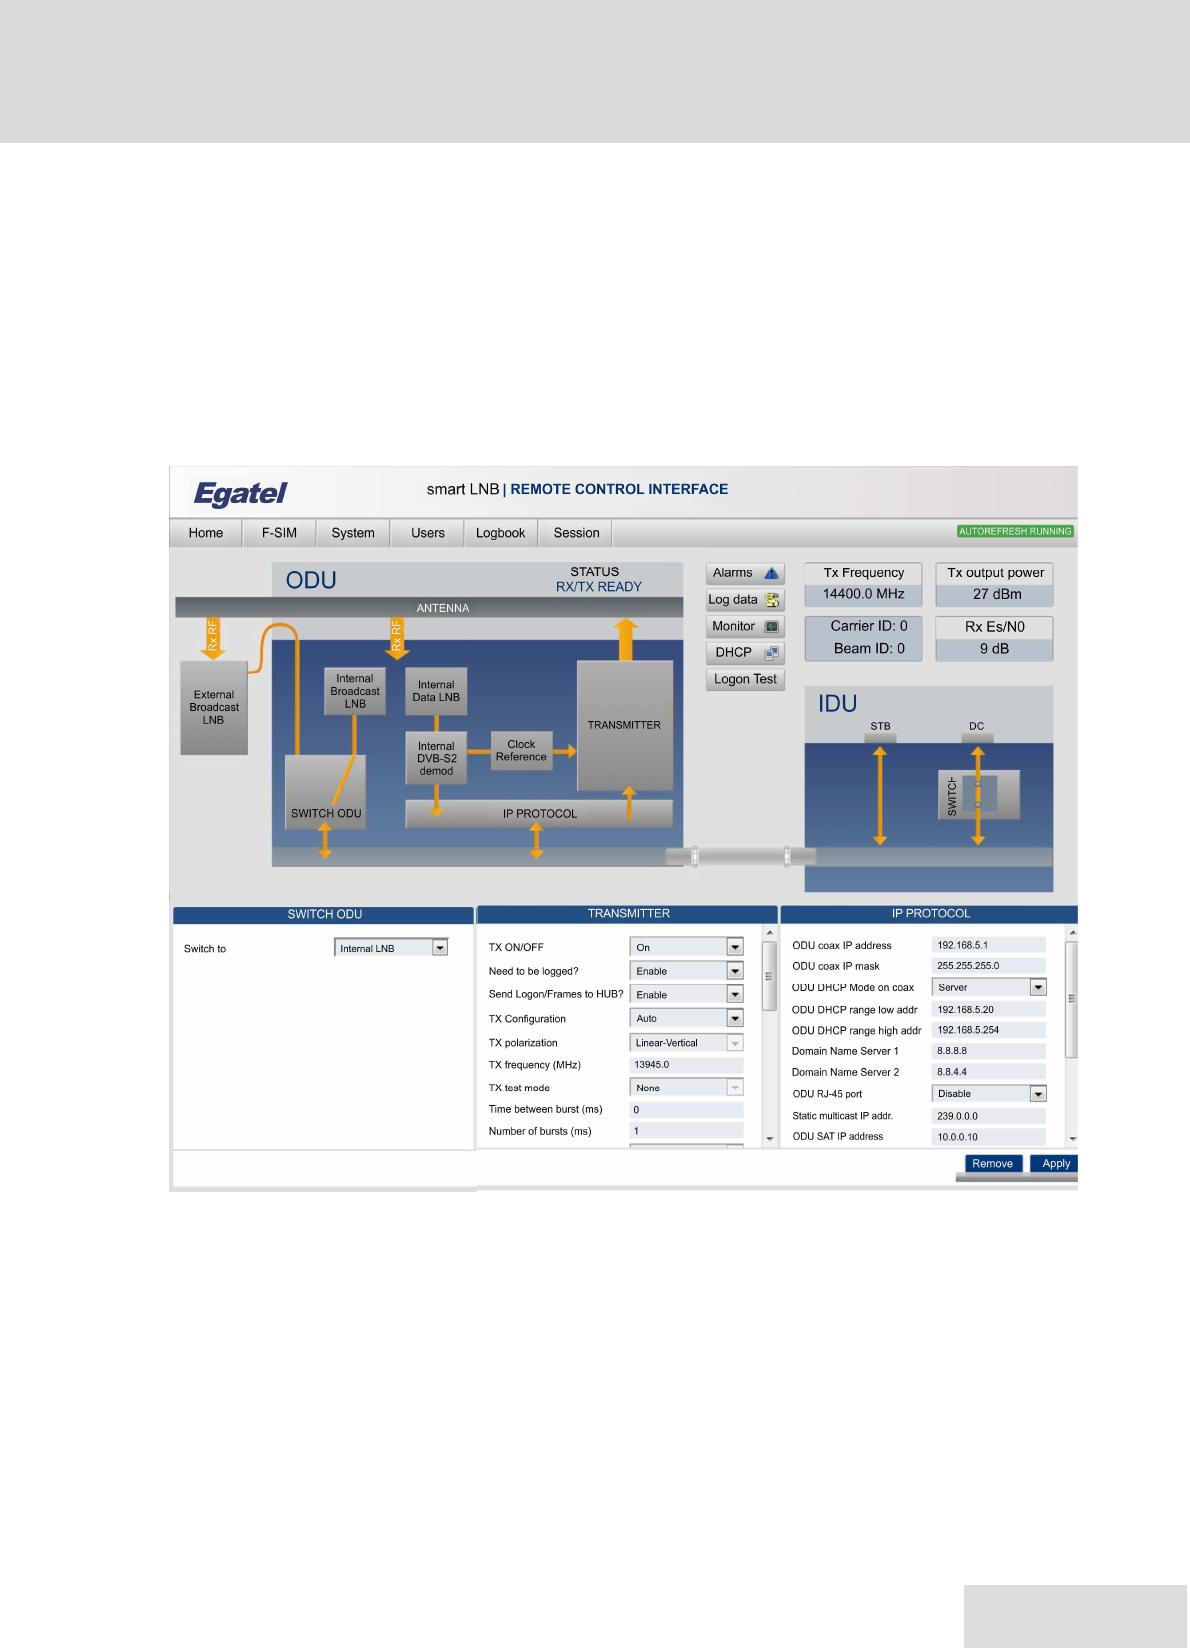 EGATEL SL 820003-02 Satellite Terminal Equipment User Manual